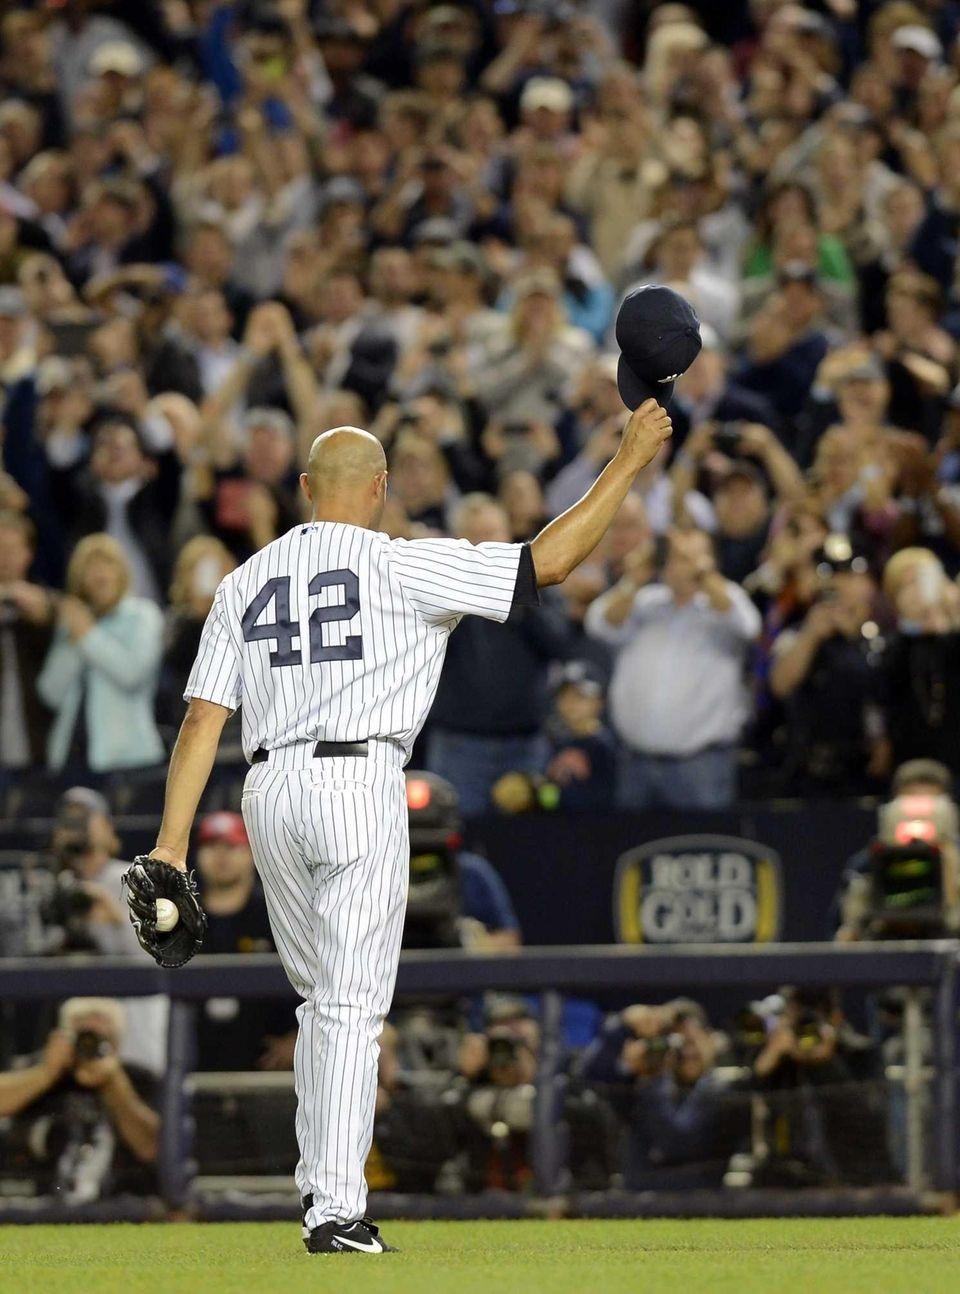 New York Yankees pitcher Mariano Rivera tips his